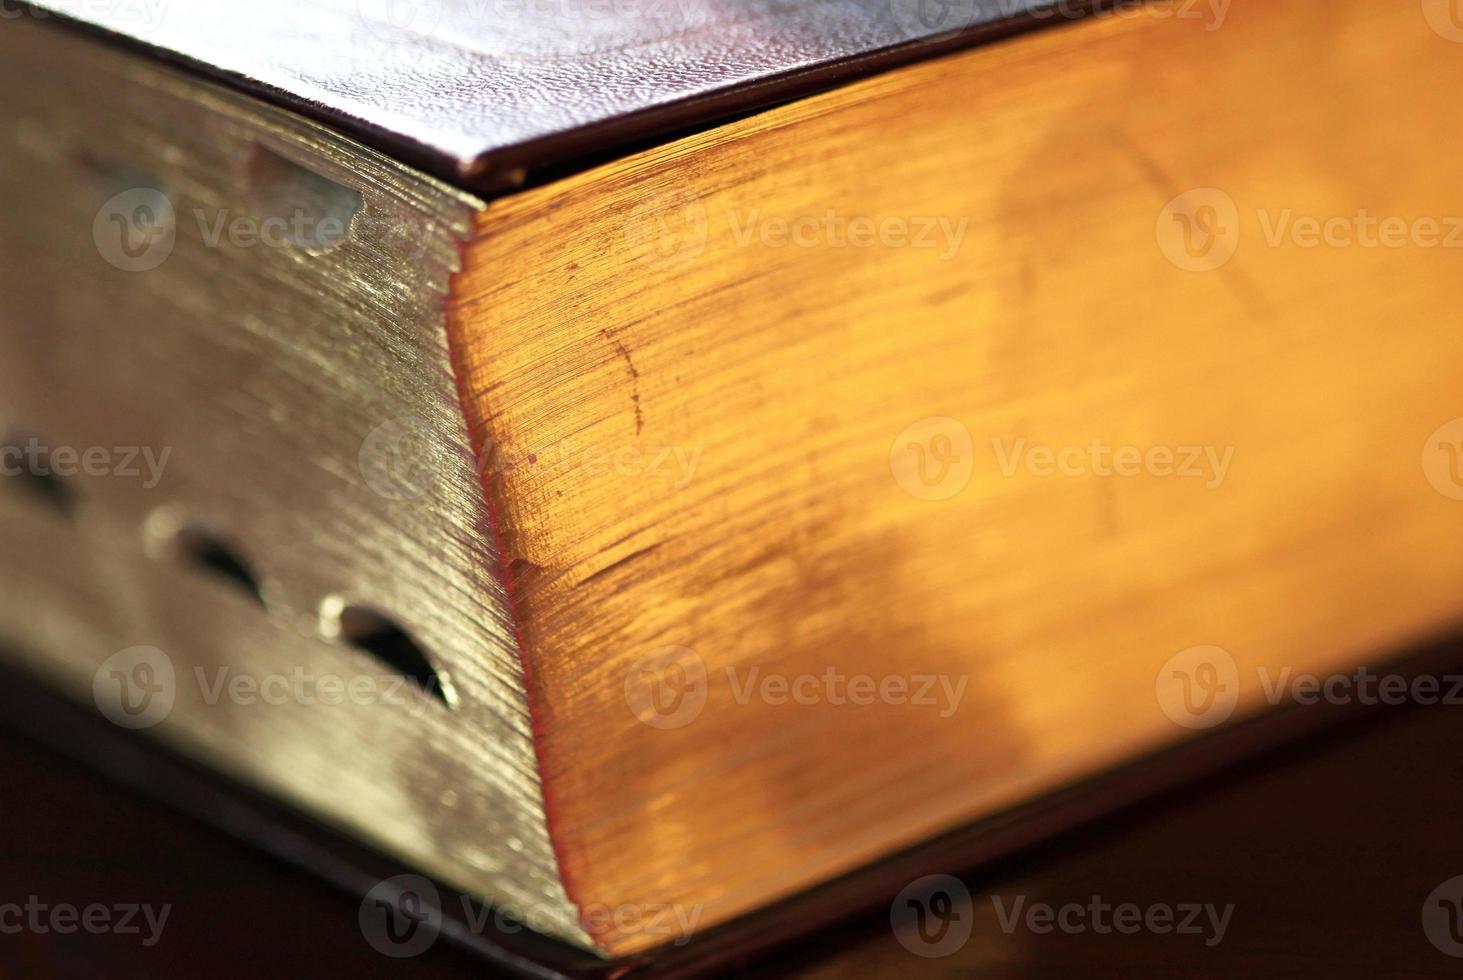 bijbel close up foto